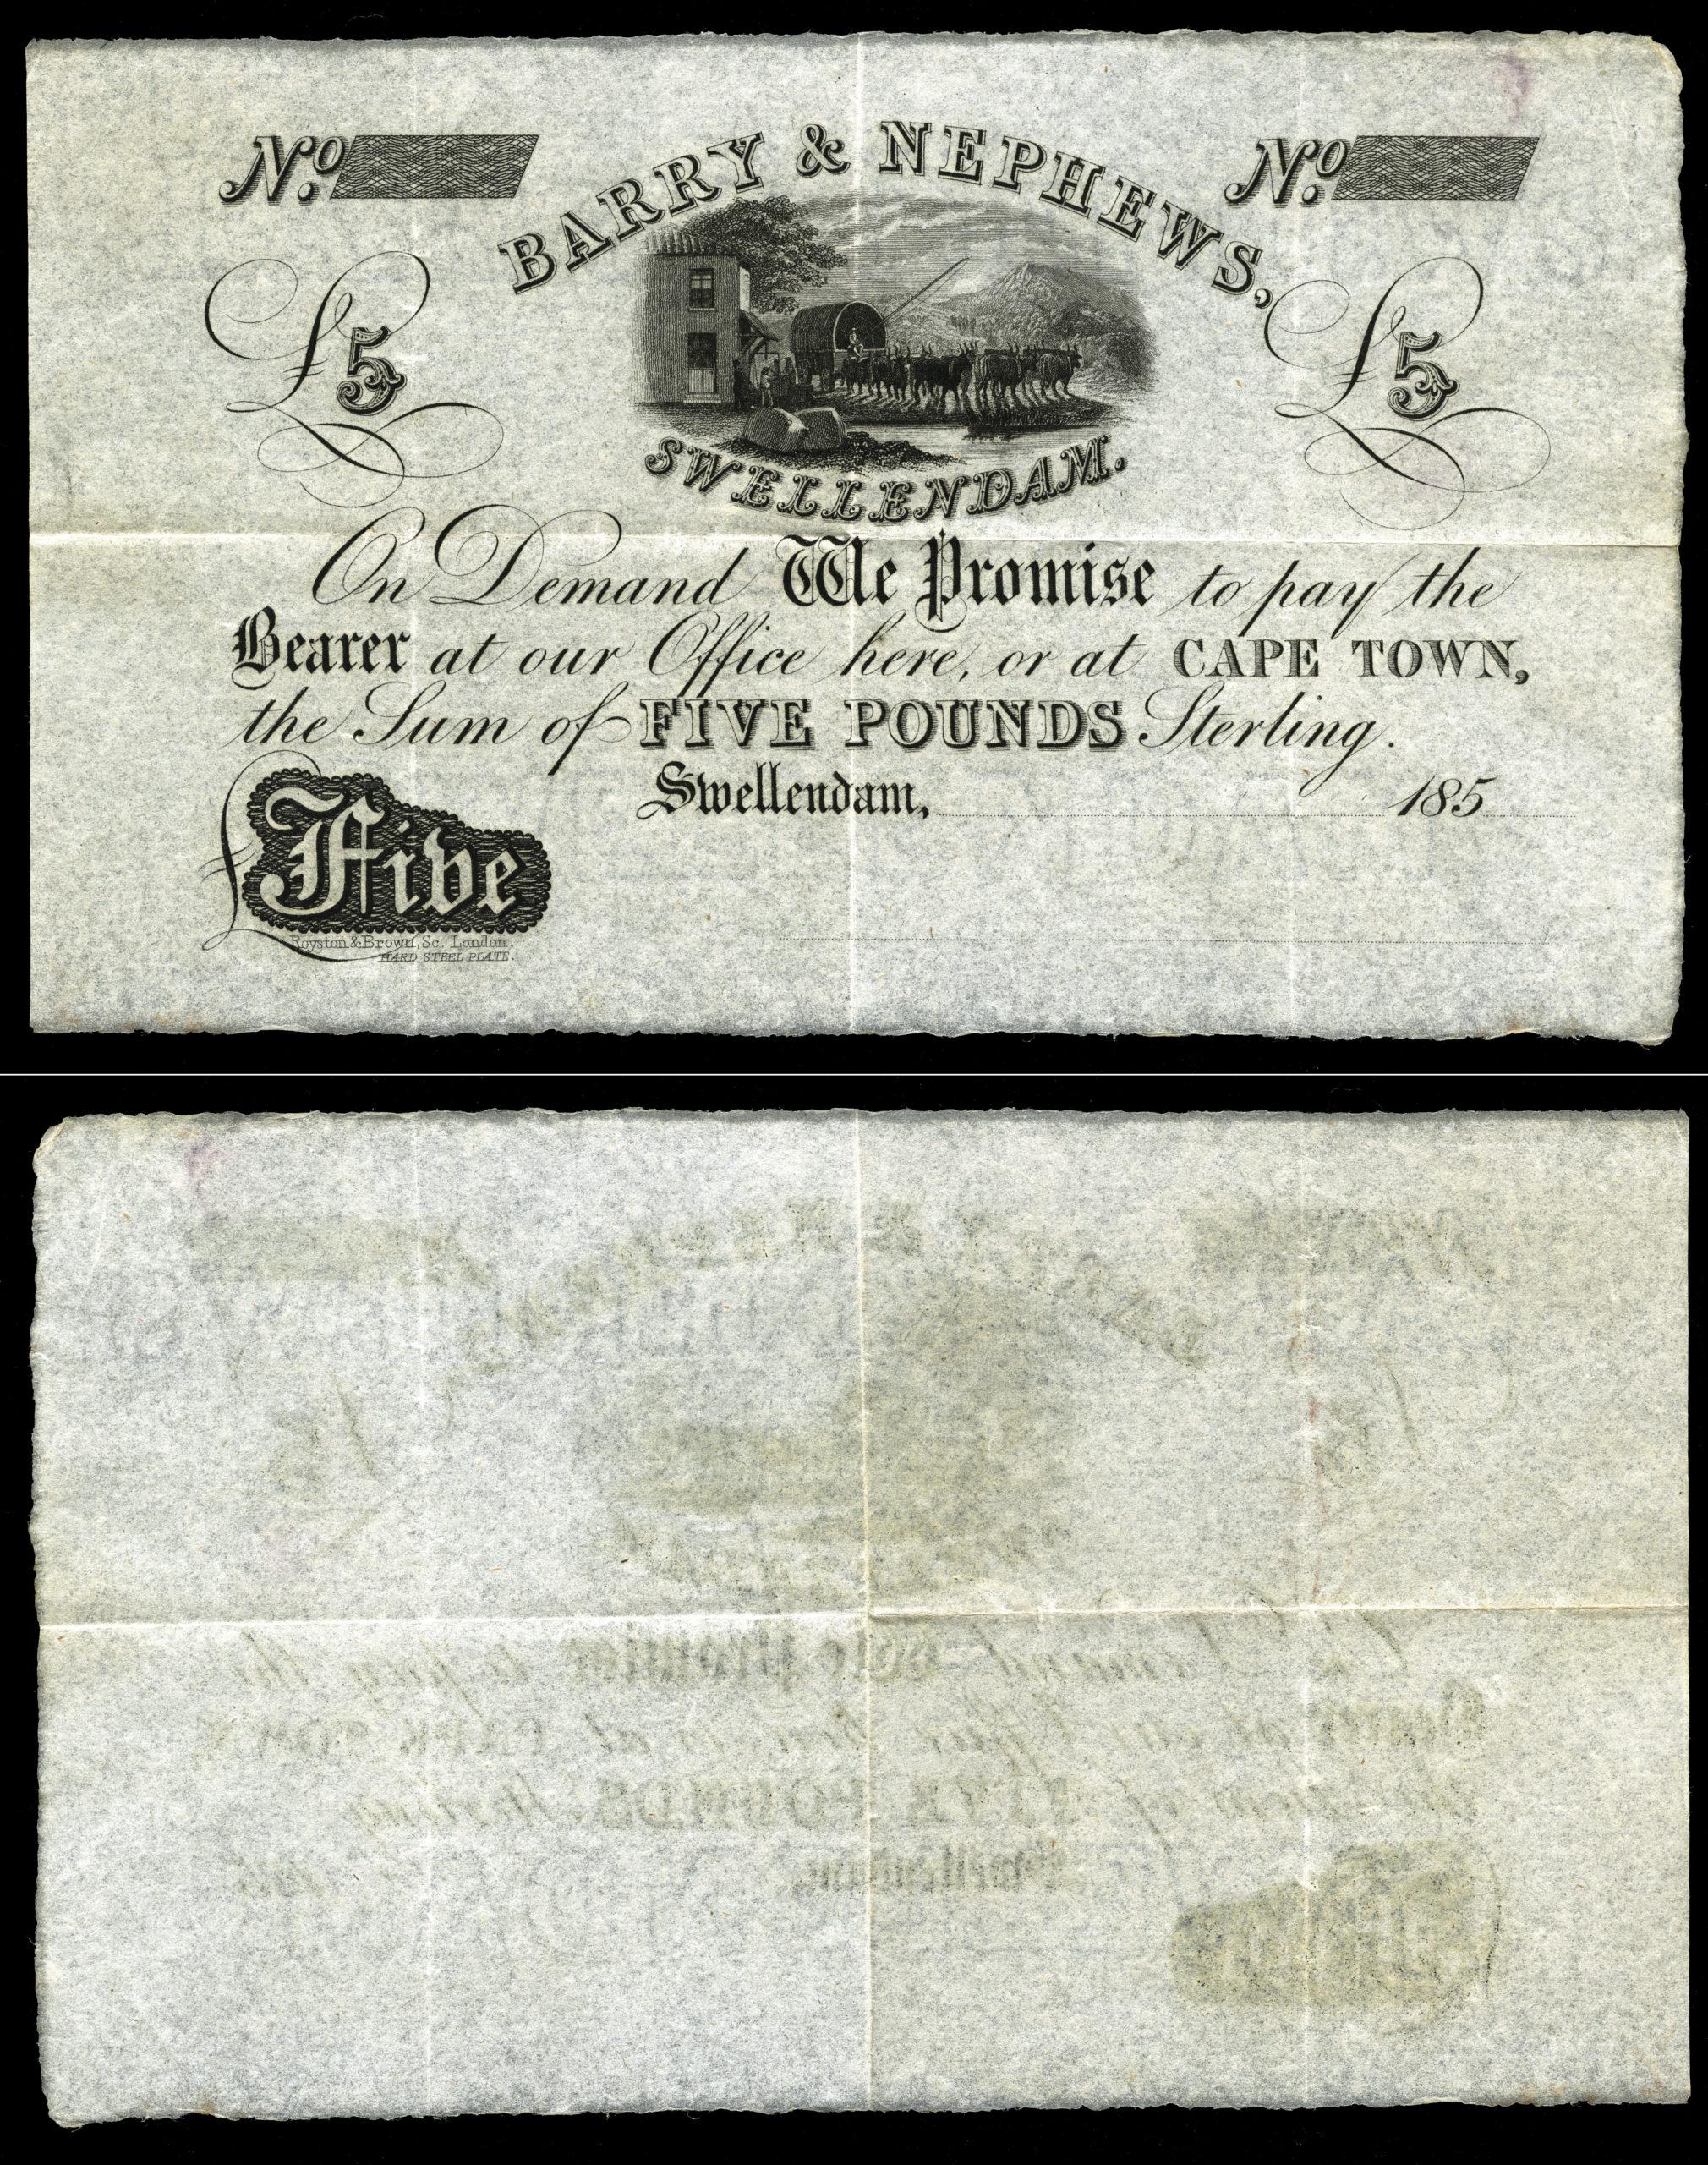 South Africa, Swellendam £5, C.1850